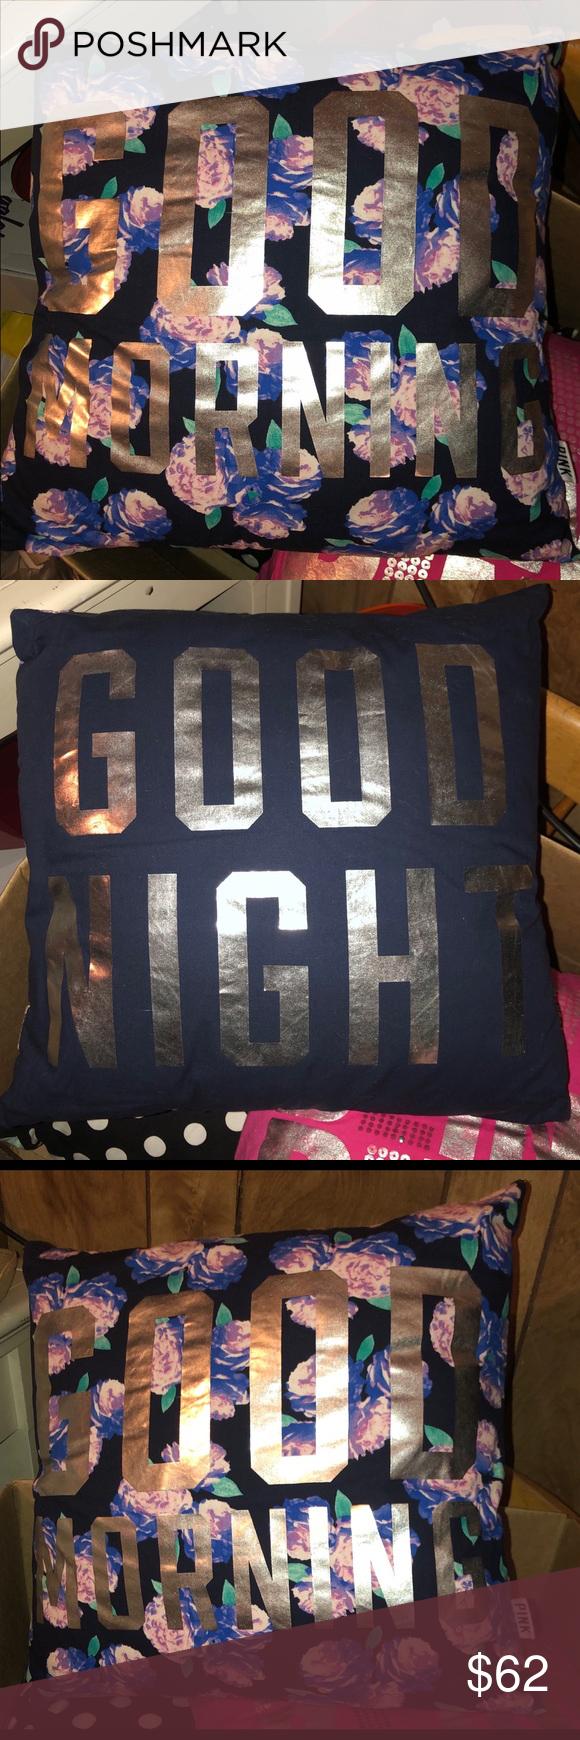 SOLD Victoria's Secret PINK Pillow